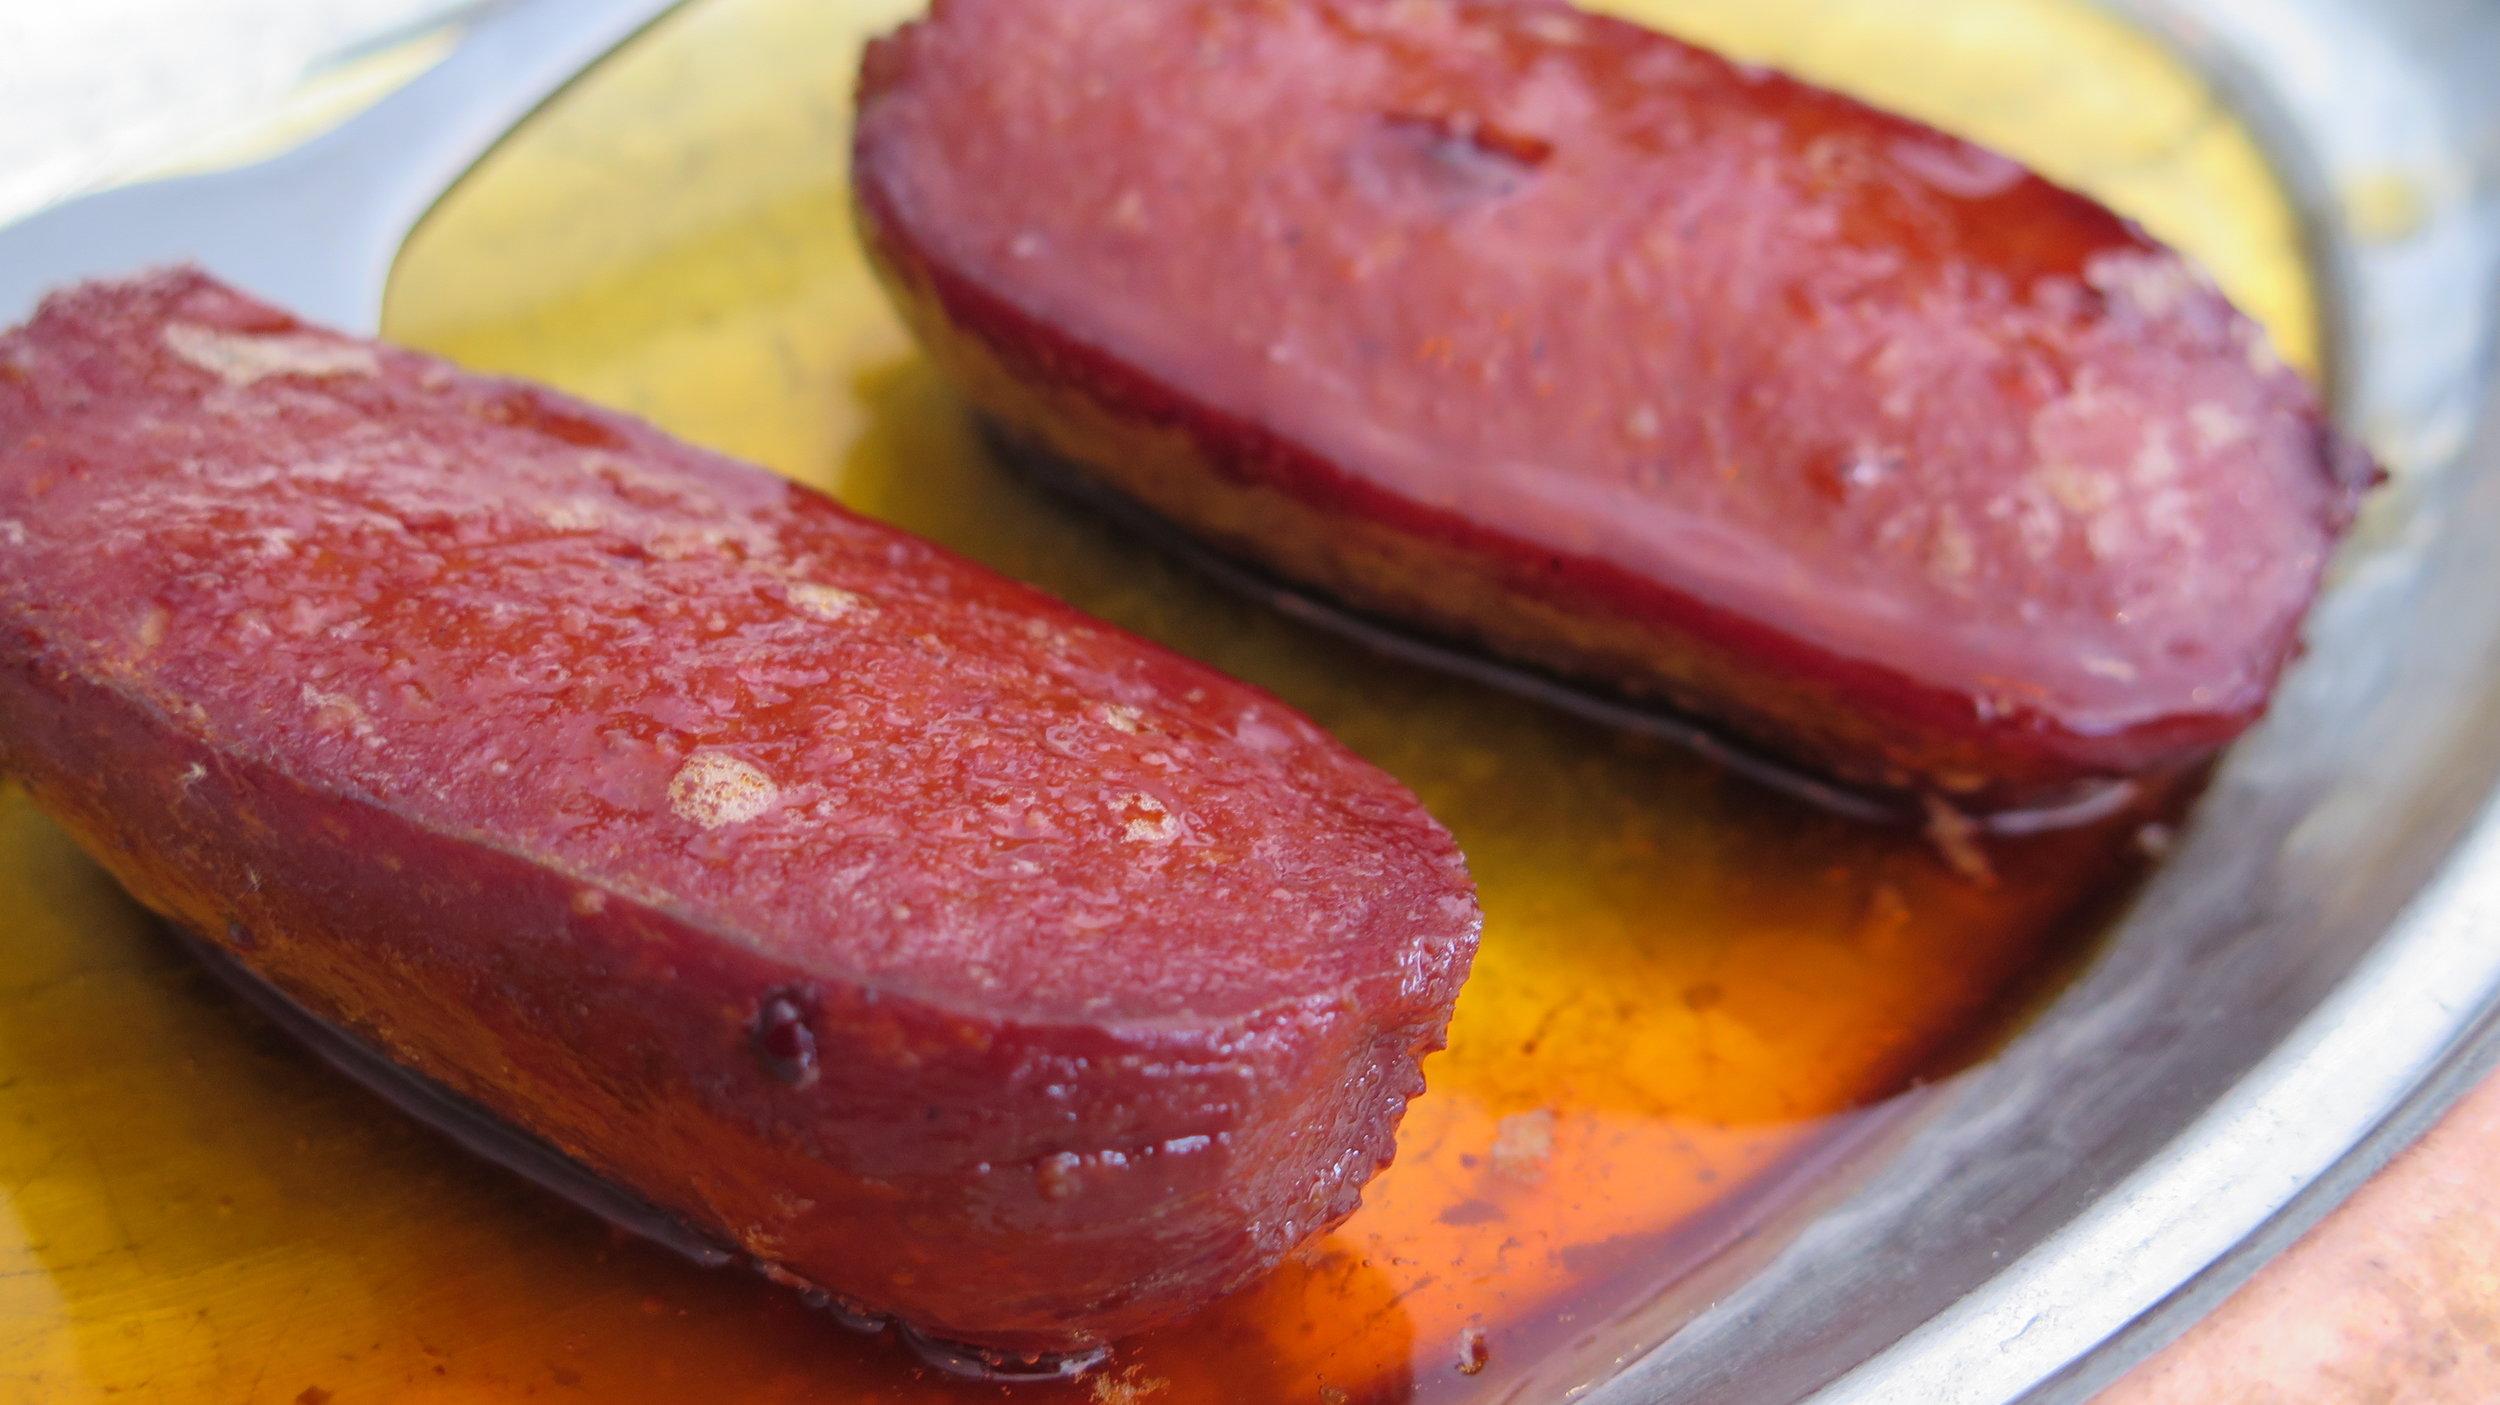 Soujuk - a dry, spicy Turkish Sausage